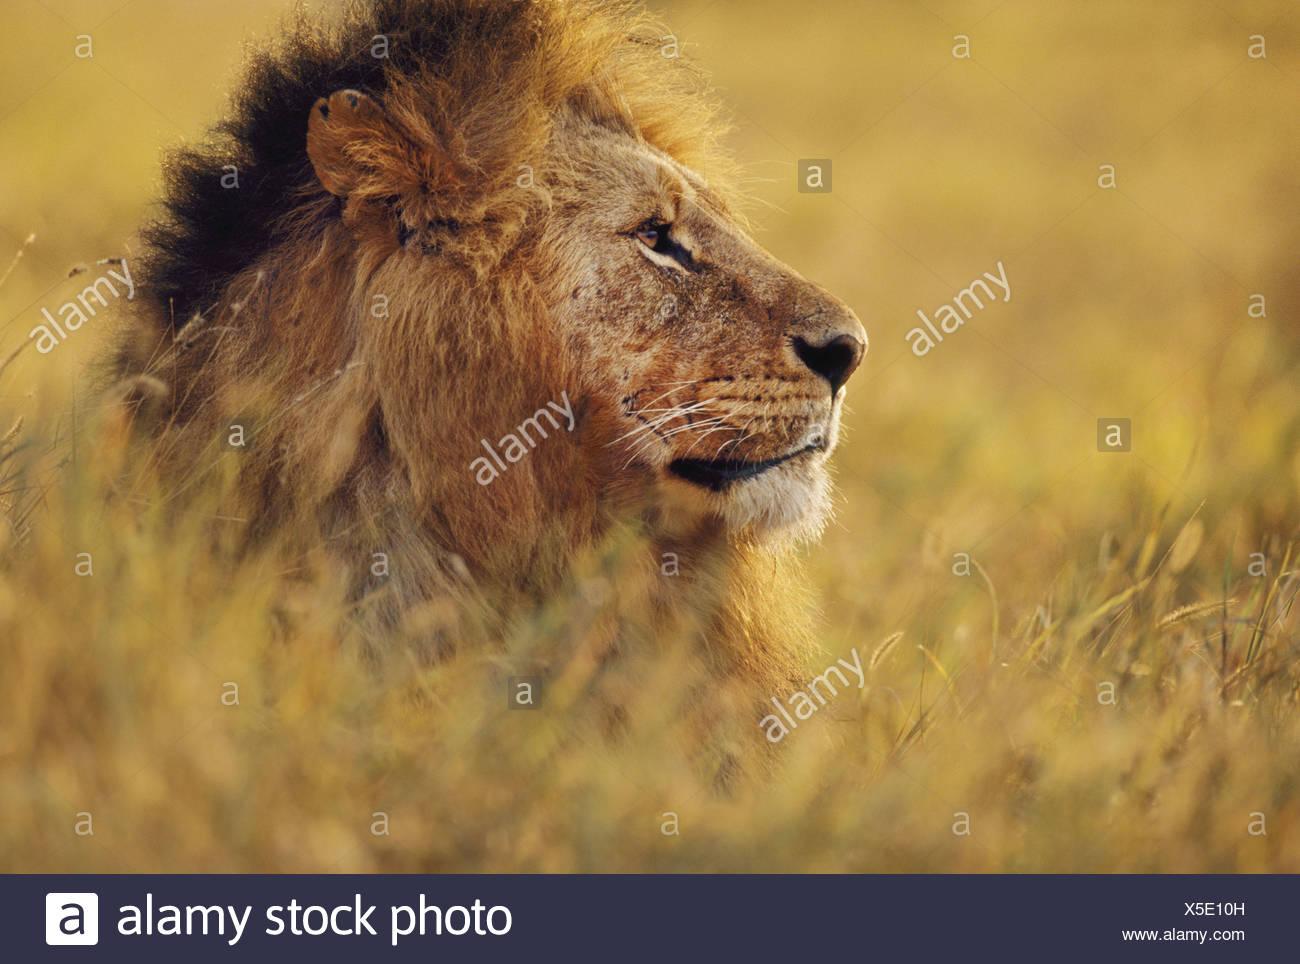 Masai Mara Reserve Kenya Lion Pantherleo Masai MarReserve Kenya - Stock Image